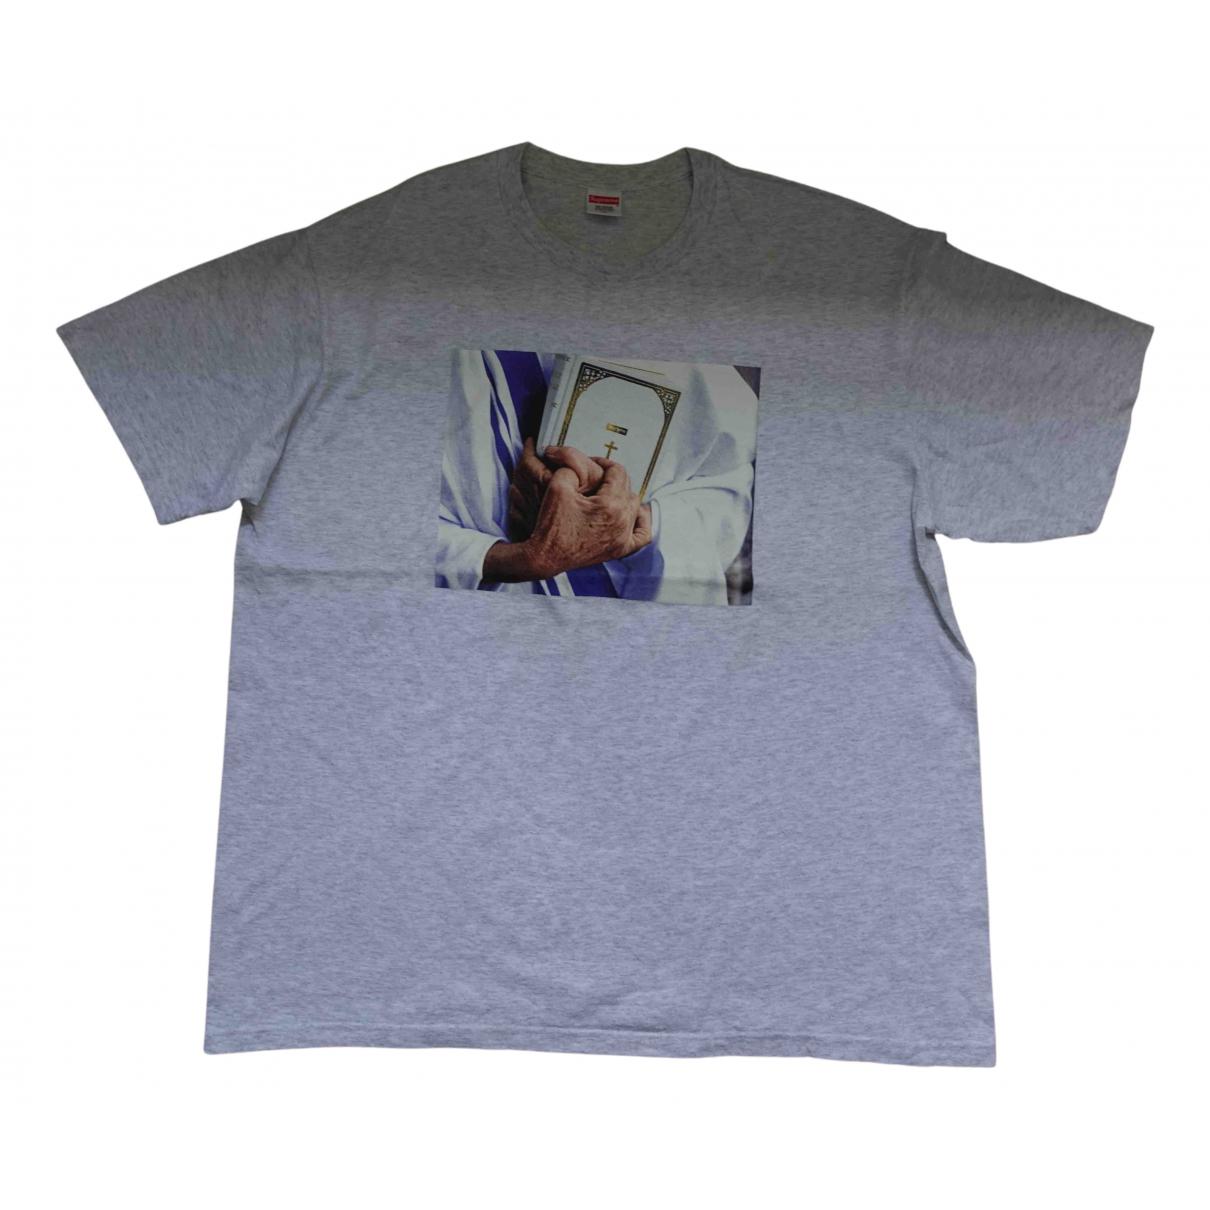 Supreme N Cotton T-shirts for Men XL International